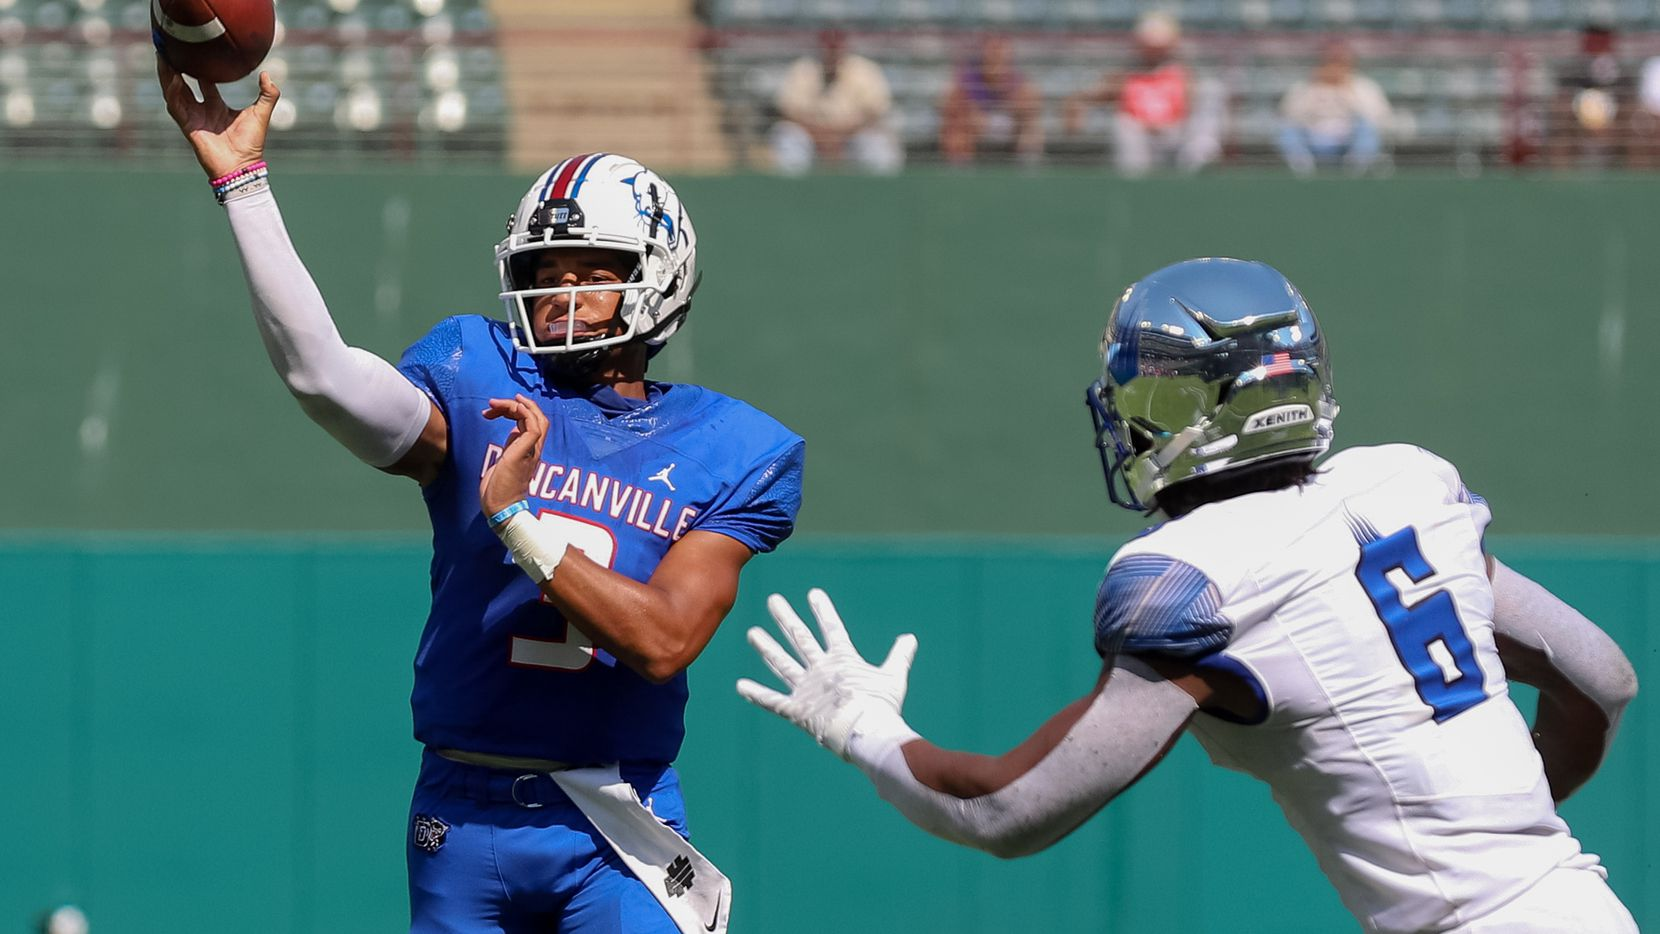 Duncanville quarterback Grayson James throws a pass against Florida's IMG Academy on October 10, 2020. (Elias Valverde II/Special Contributor)